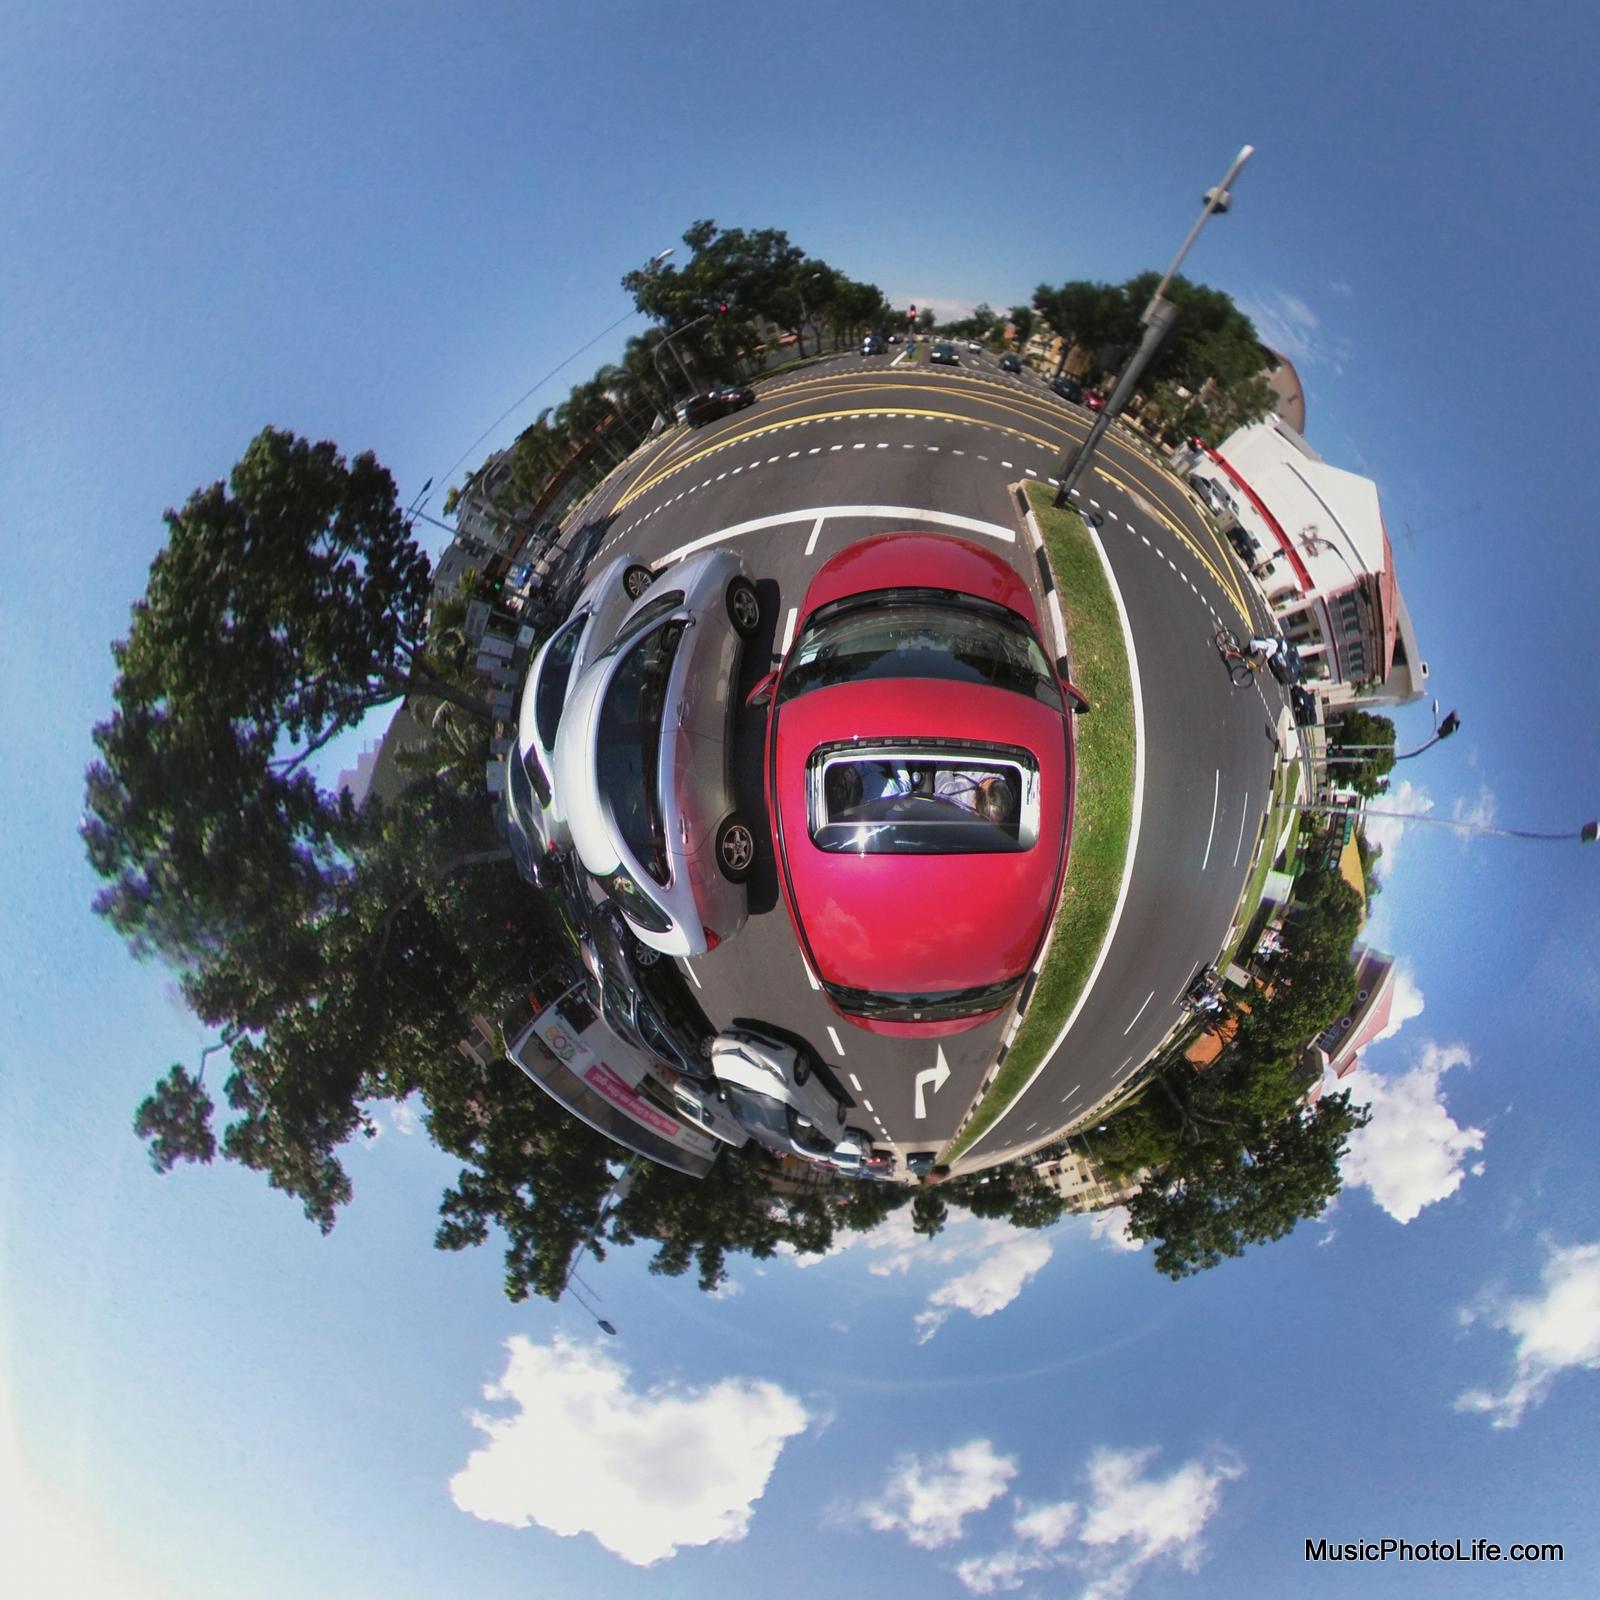 LG 360 CAM - little planet